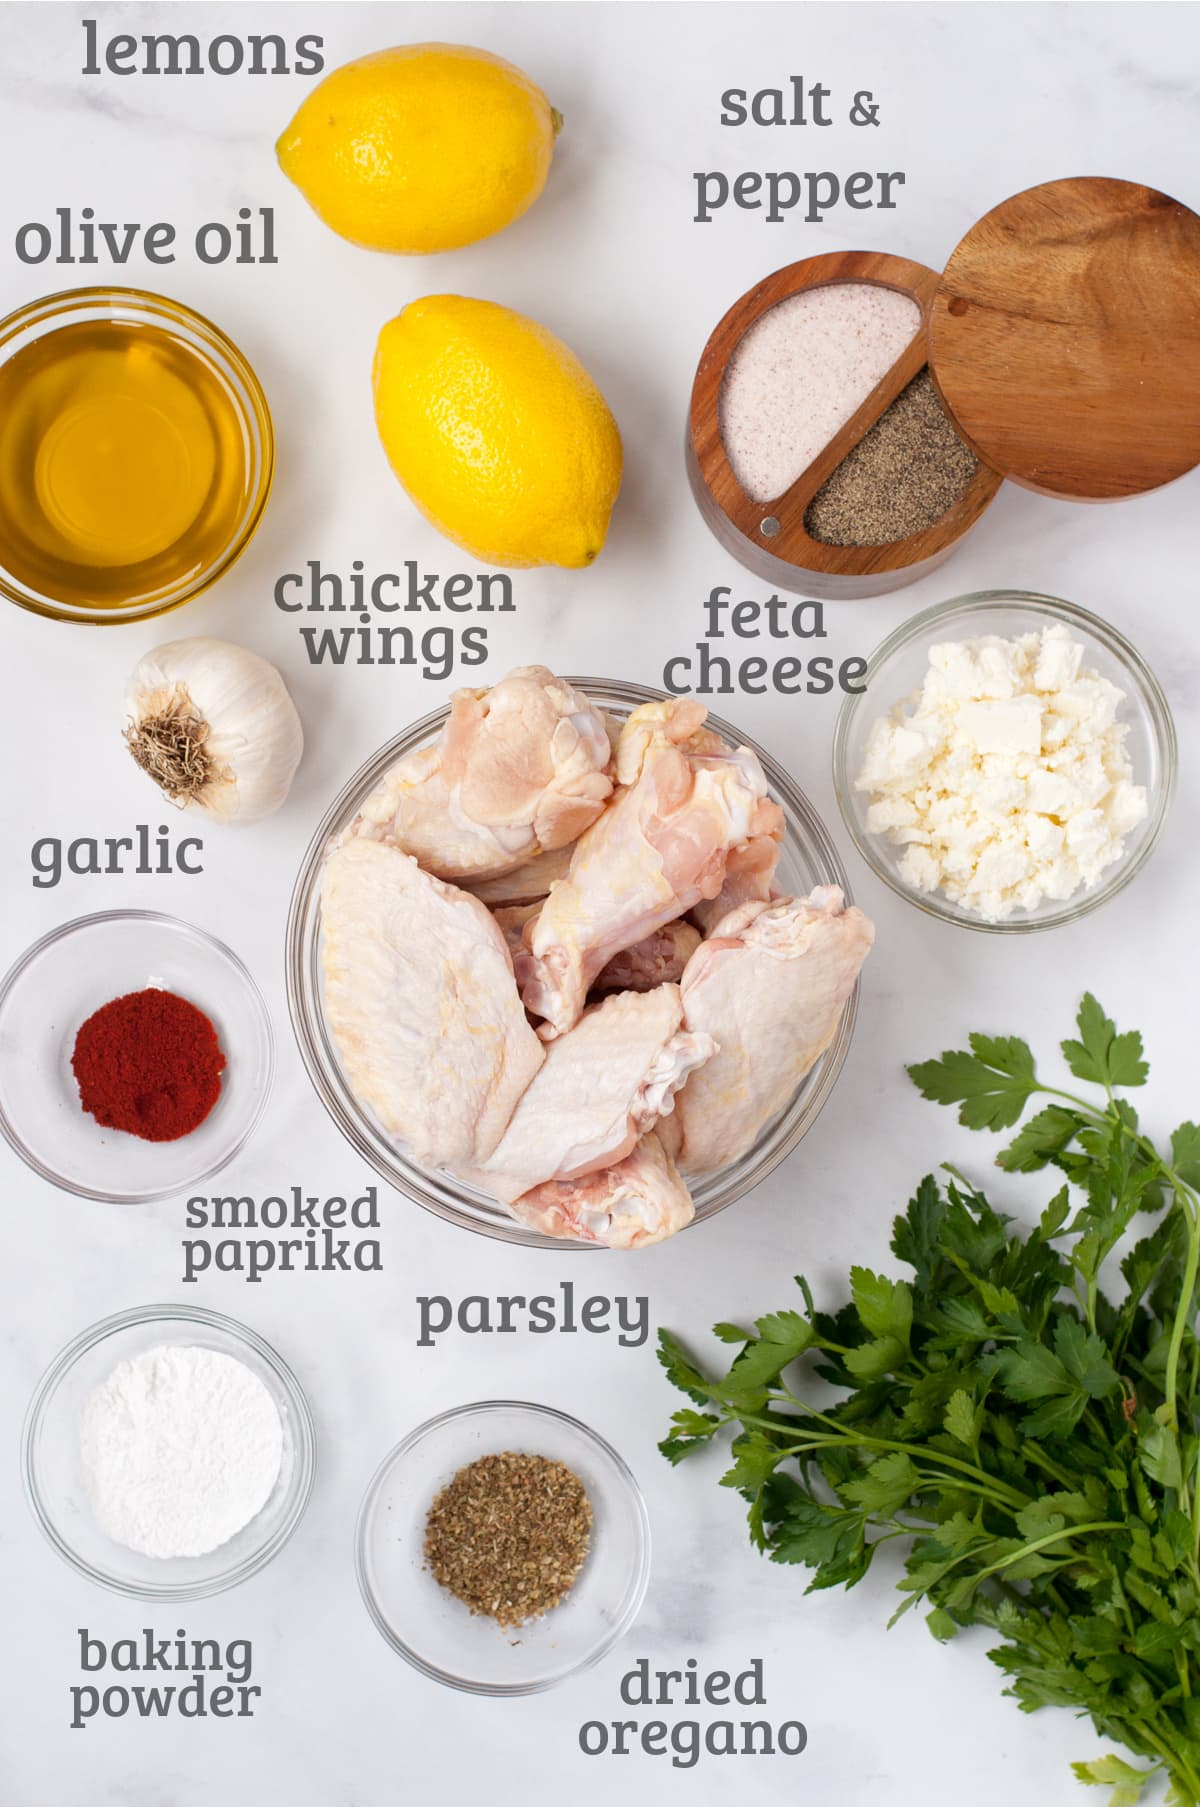 ingredients for lemon feta chicken wings - chicken, feta, lemons, garlic, olive oil, parsley, and spices